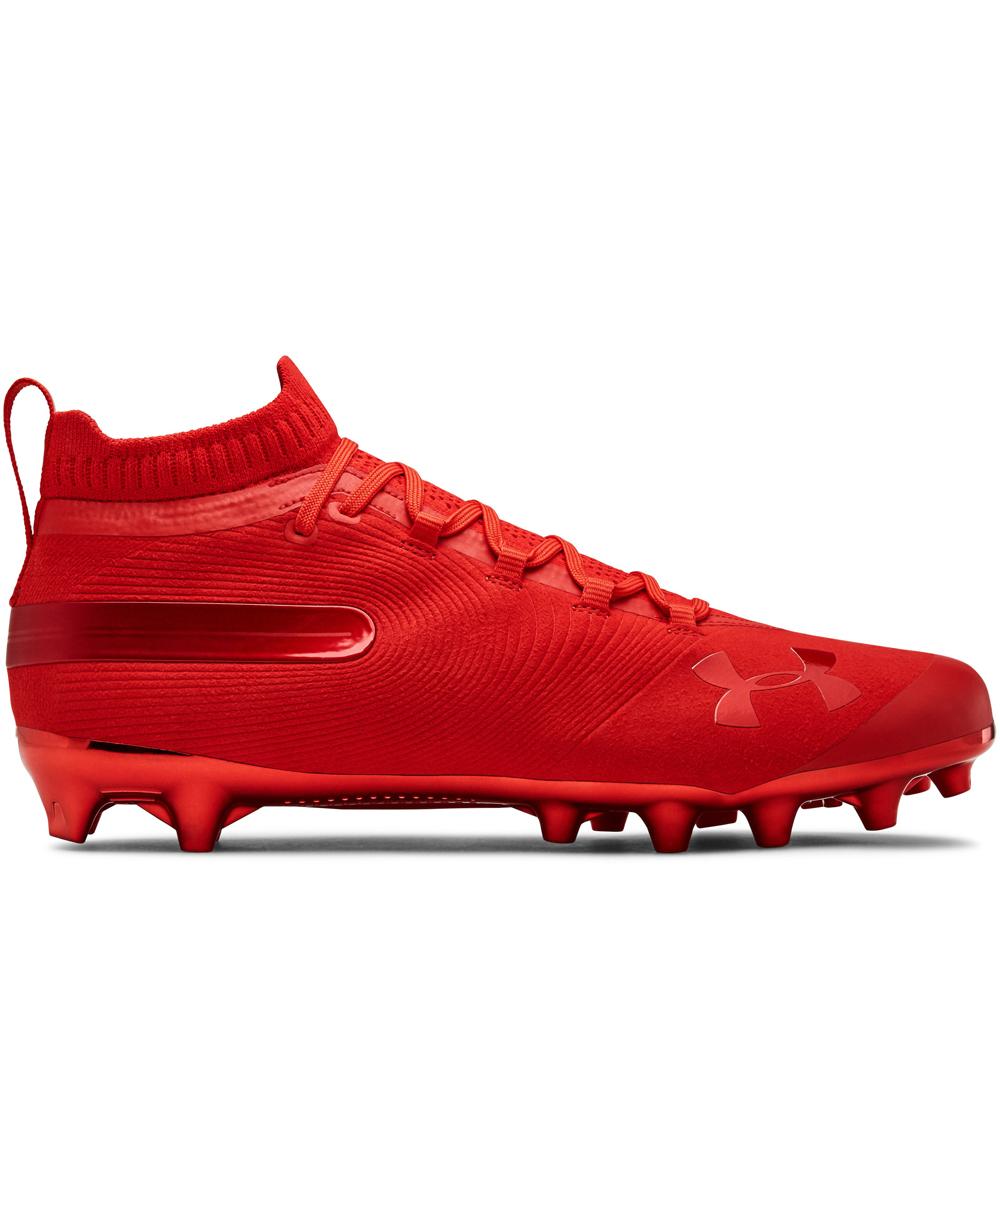 info for 47316 755c0 Spotlight Suede MC Crampons de Football Américain Homme Red